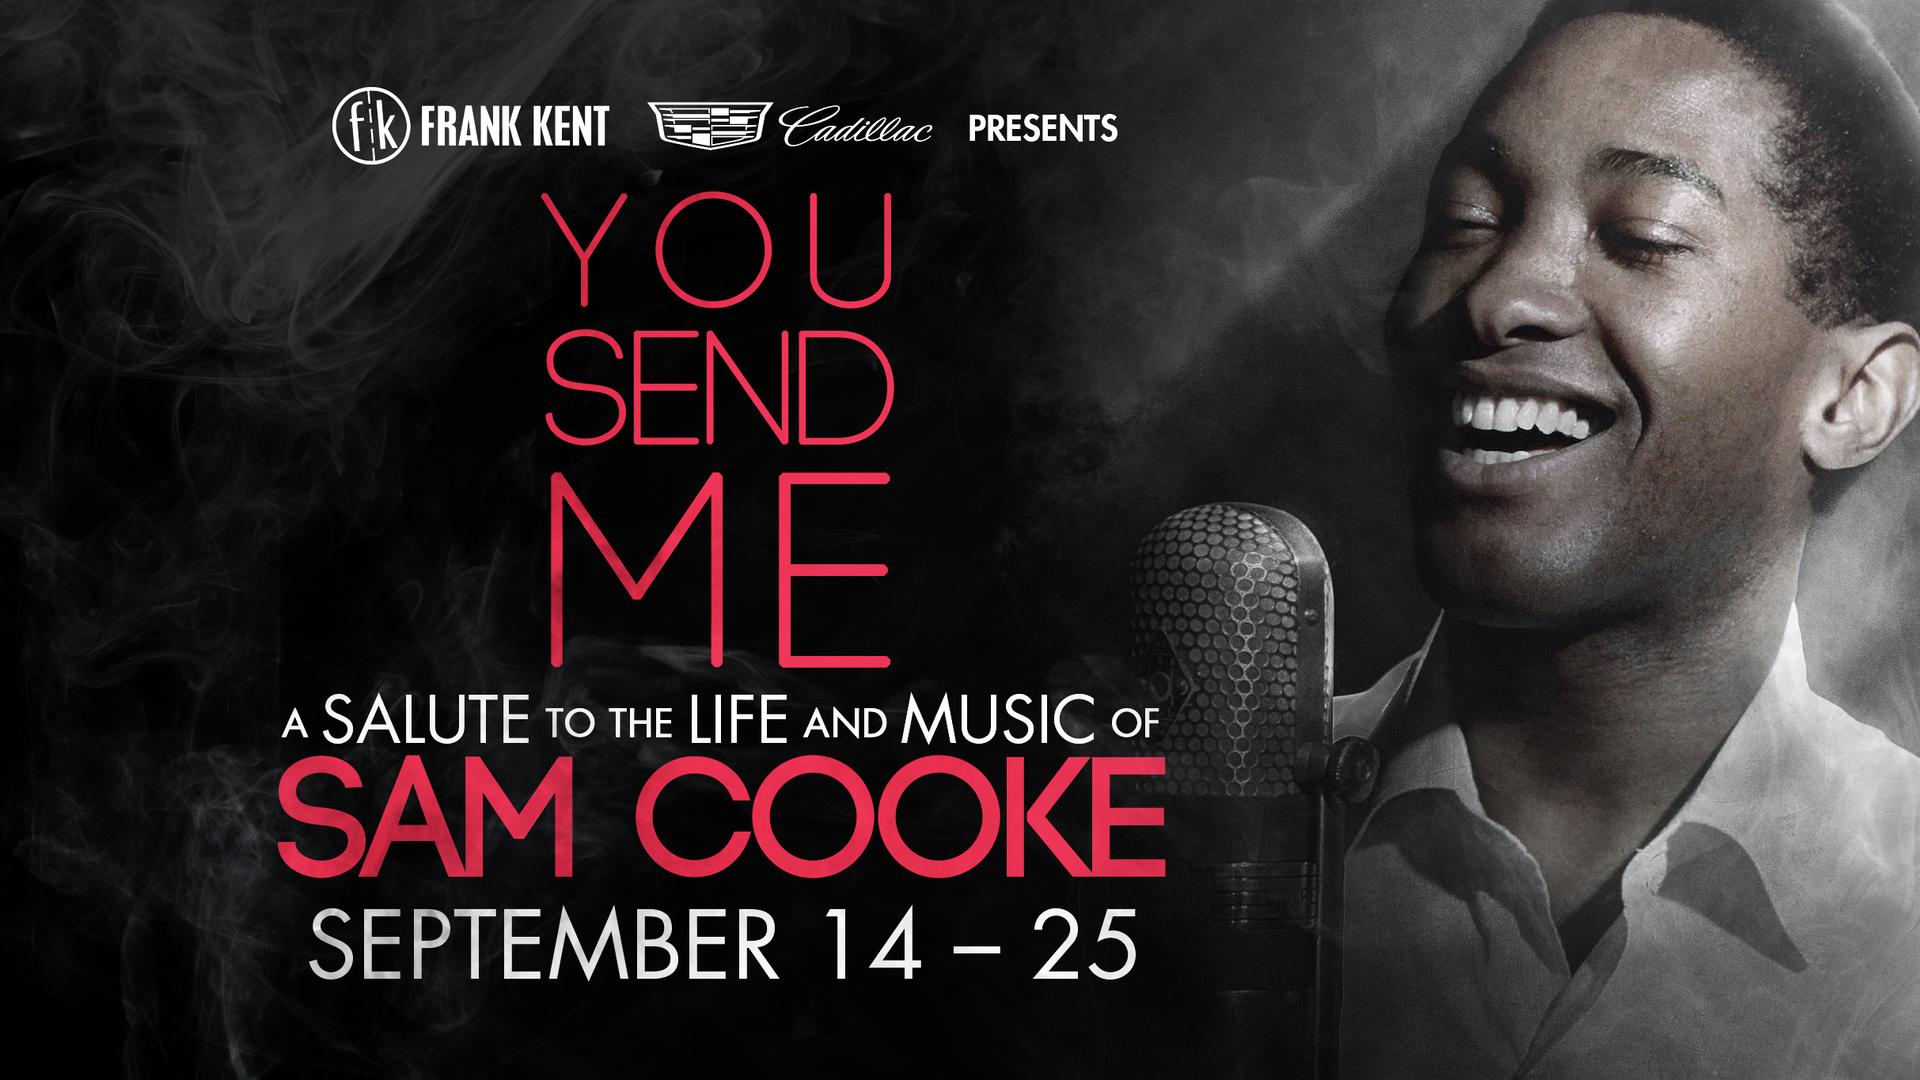 You Send Me: A Salute to the Life and Music of Sam Cooke, at Casa Mañana